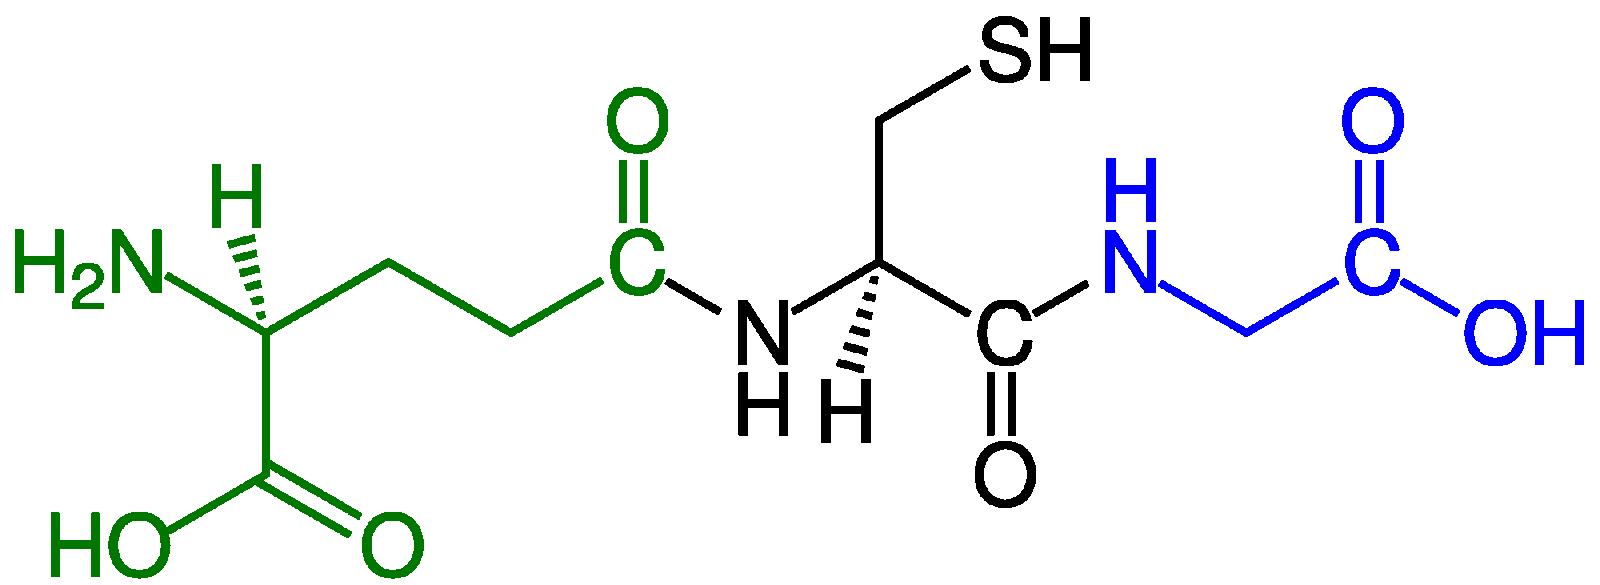 формула трипептида